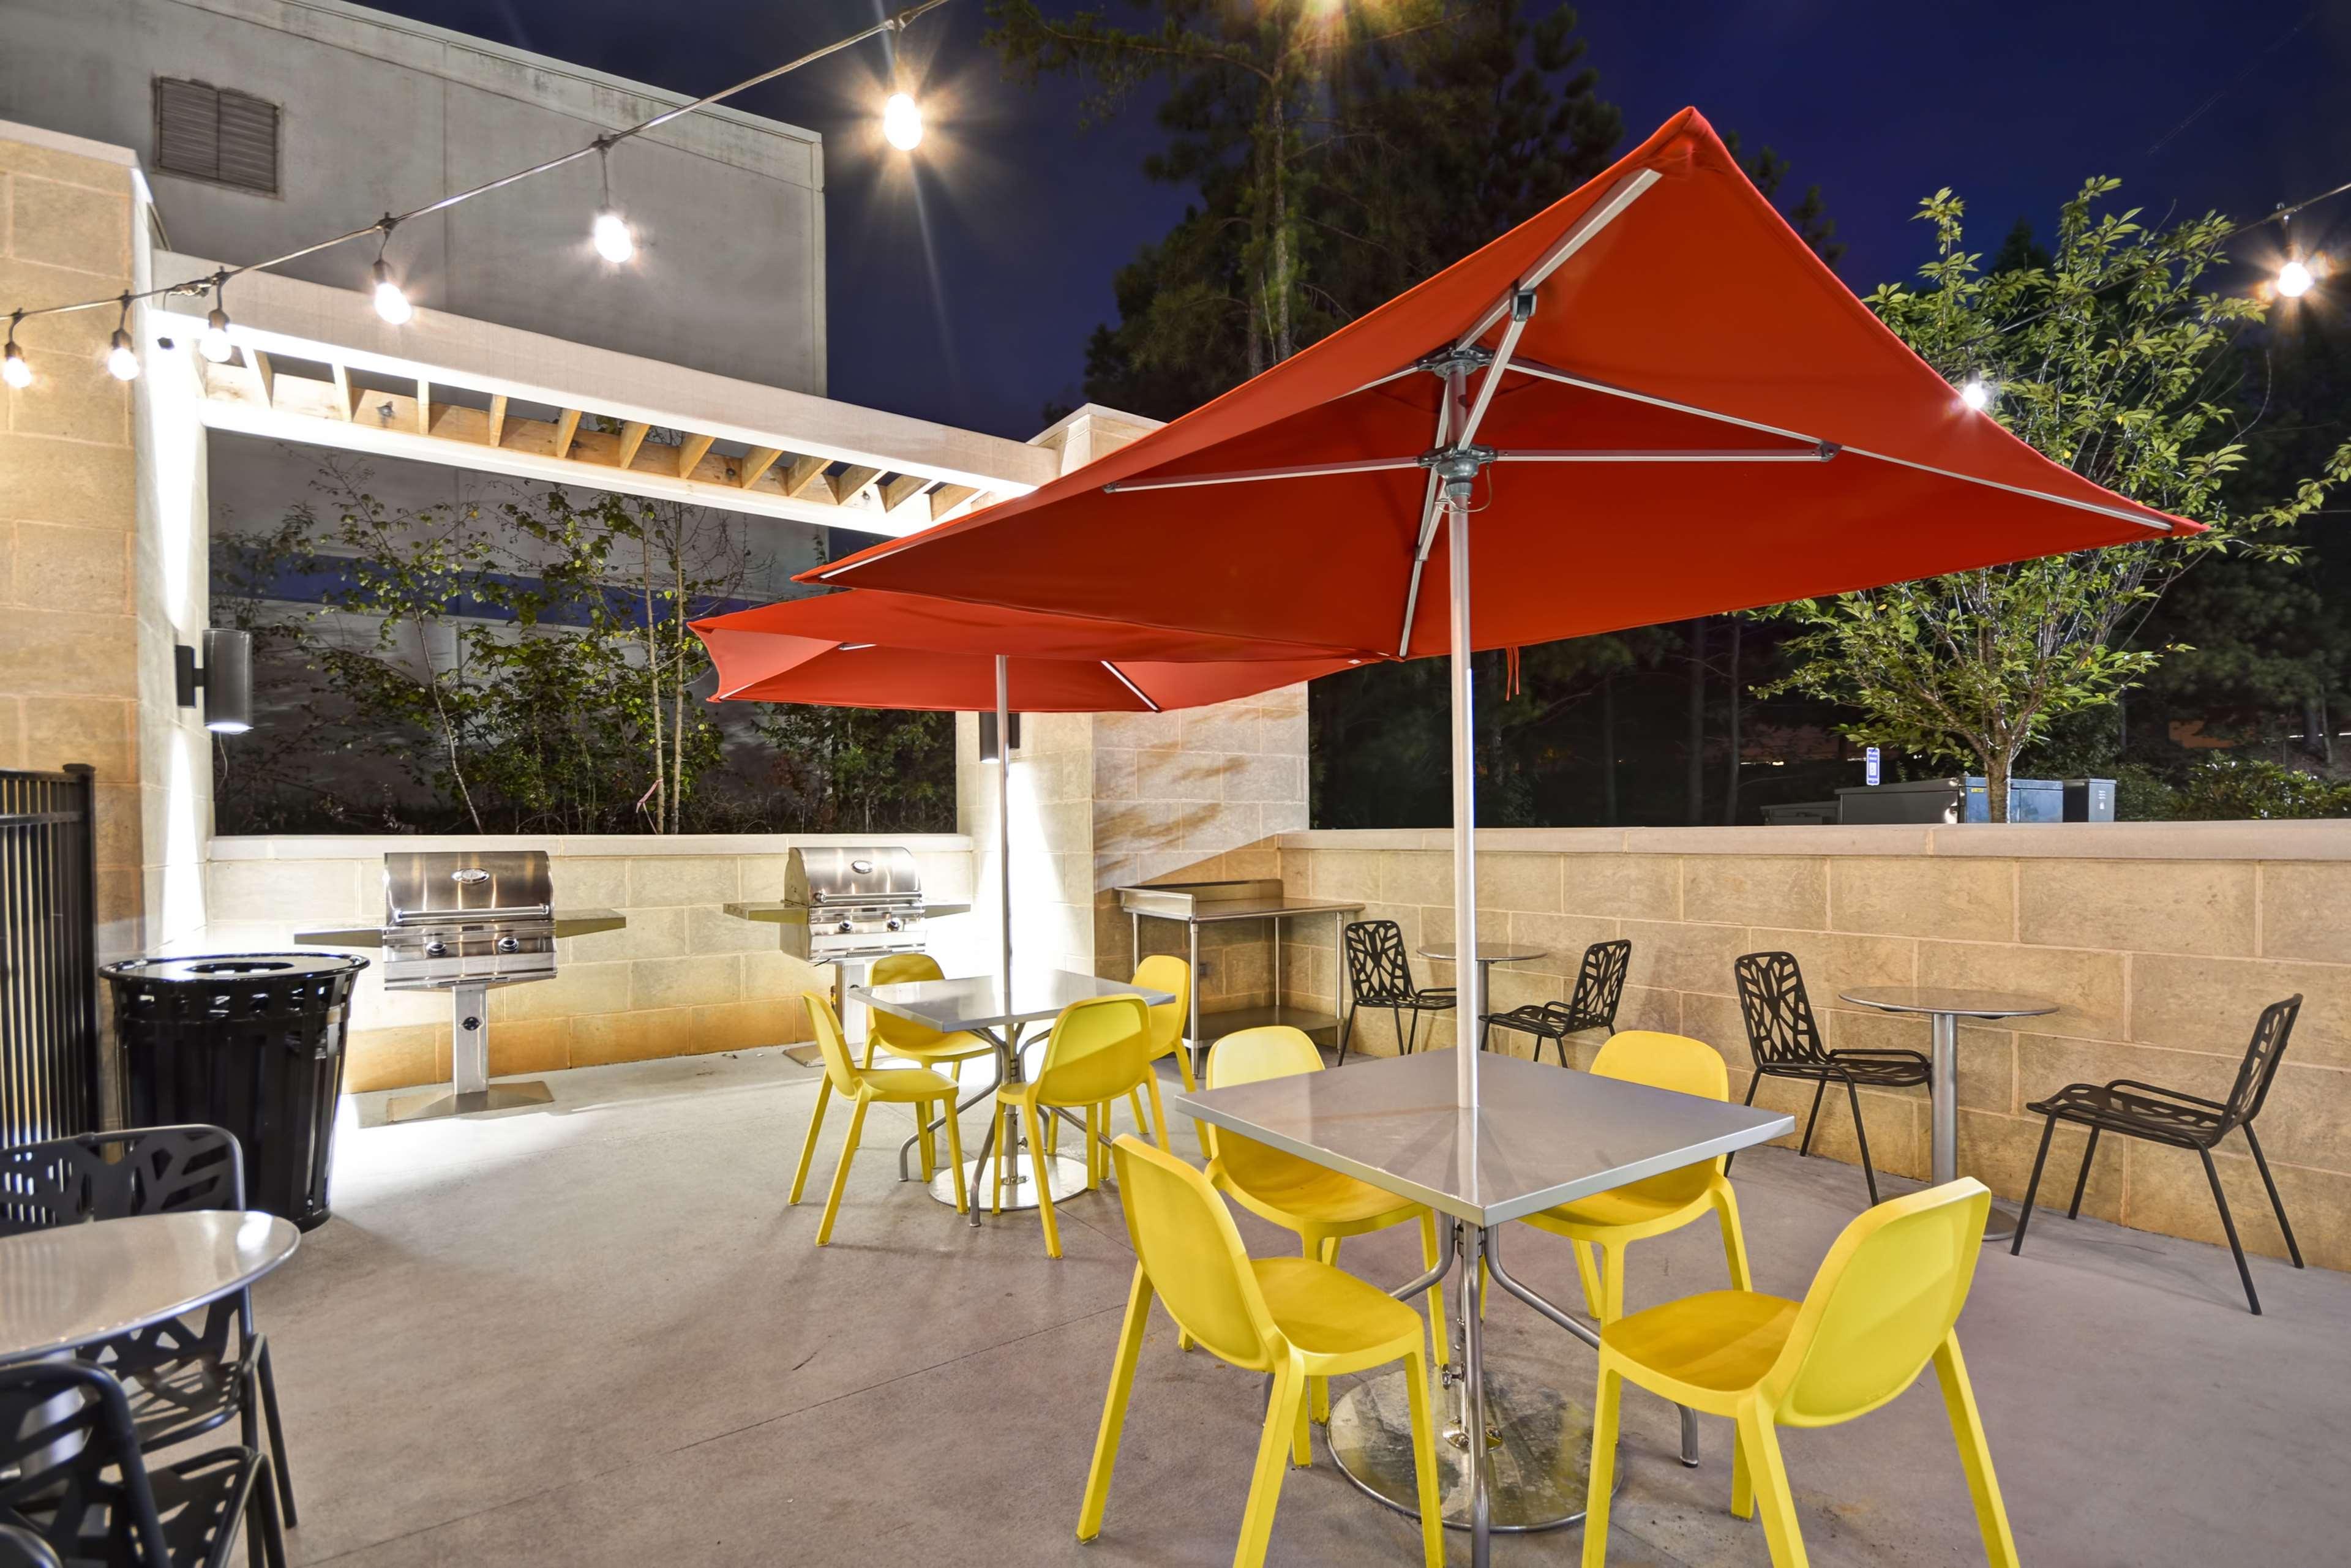 Home2 Suites by Hilton Atlanta West Lithia Springs image 5